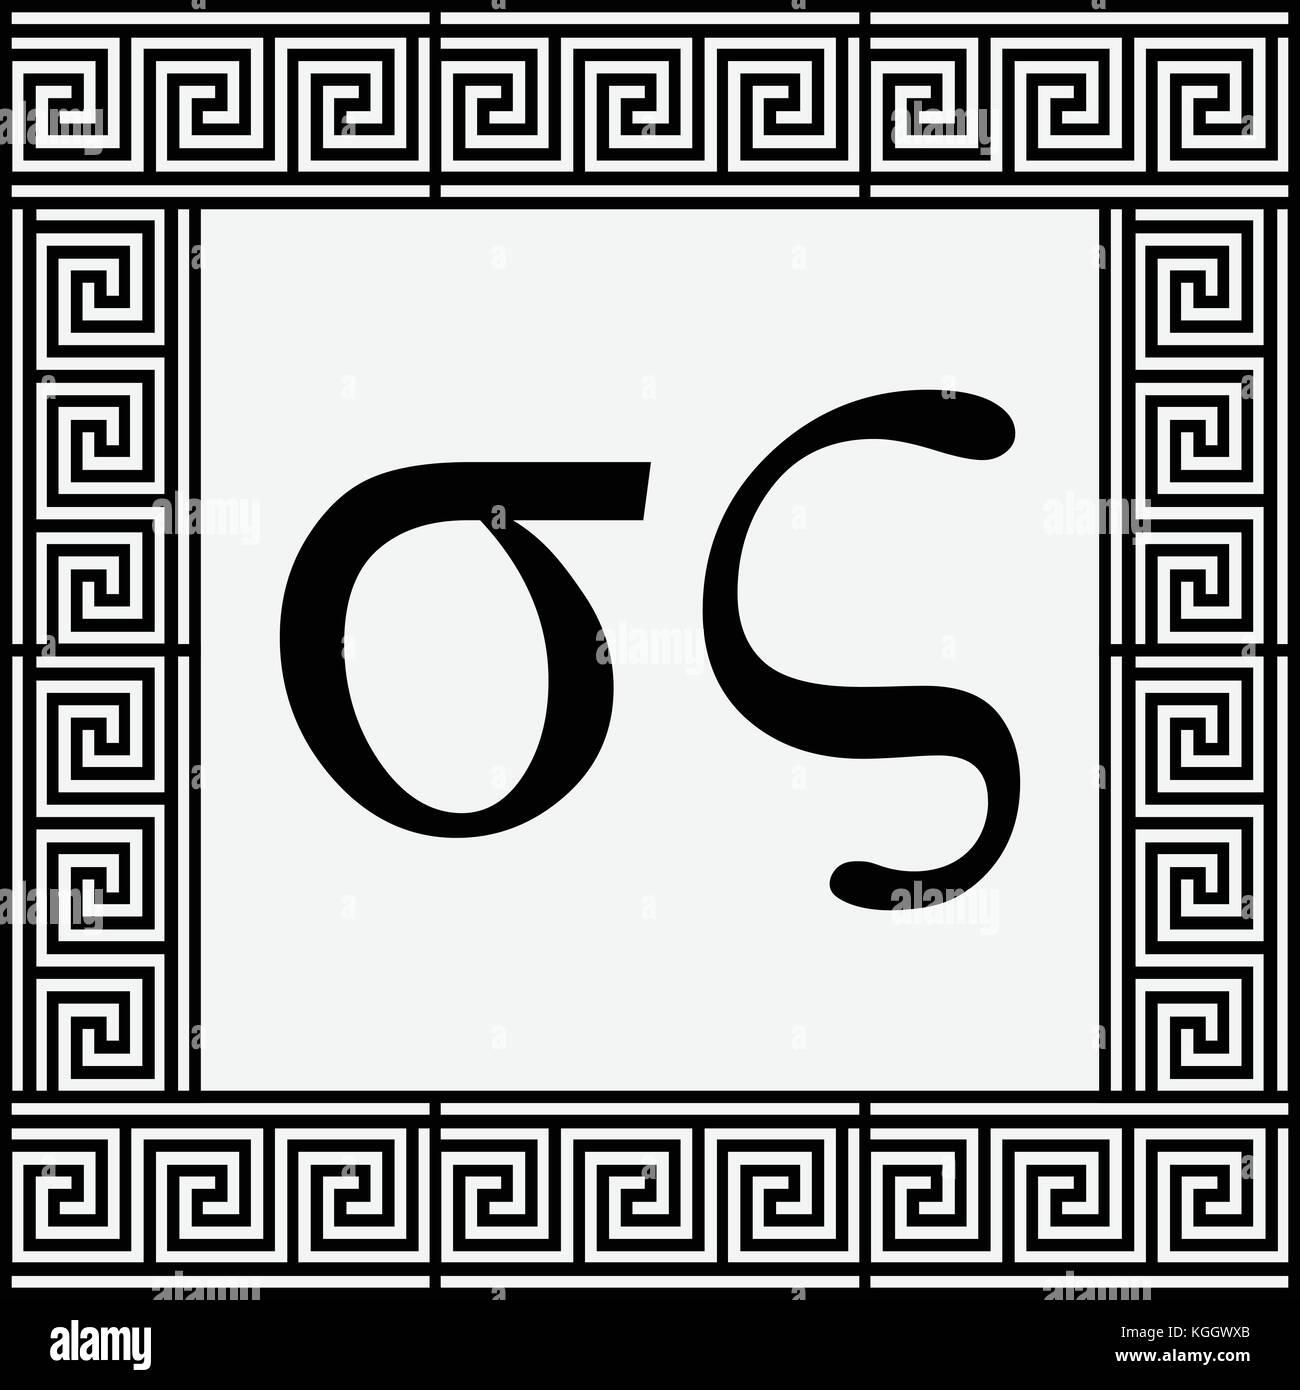 Eighth Greek Letter